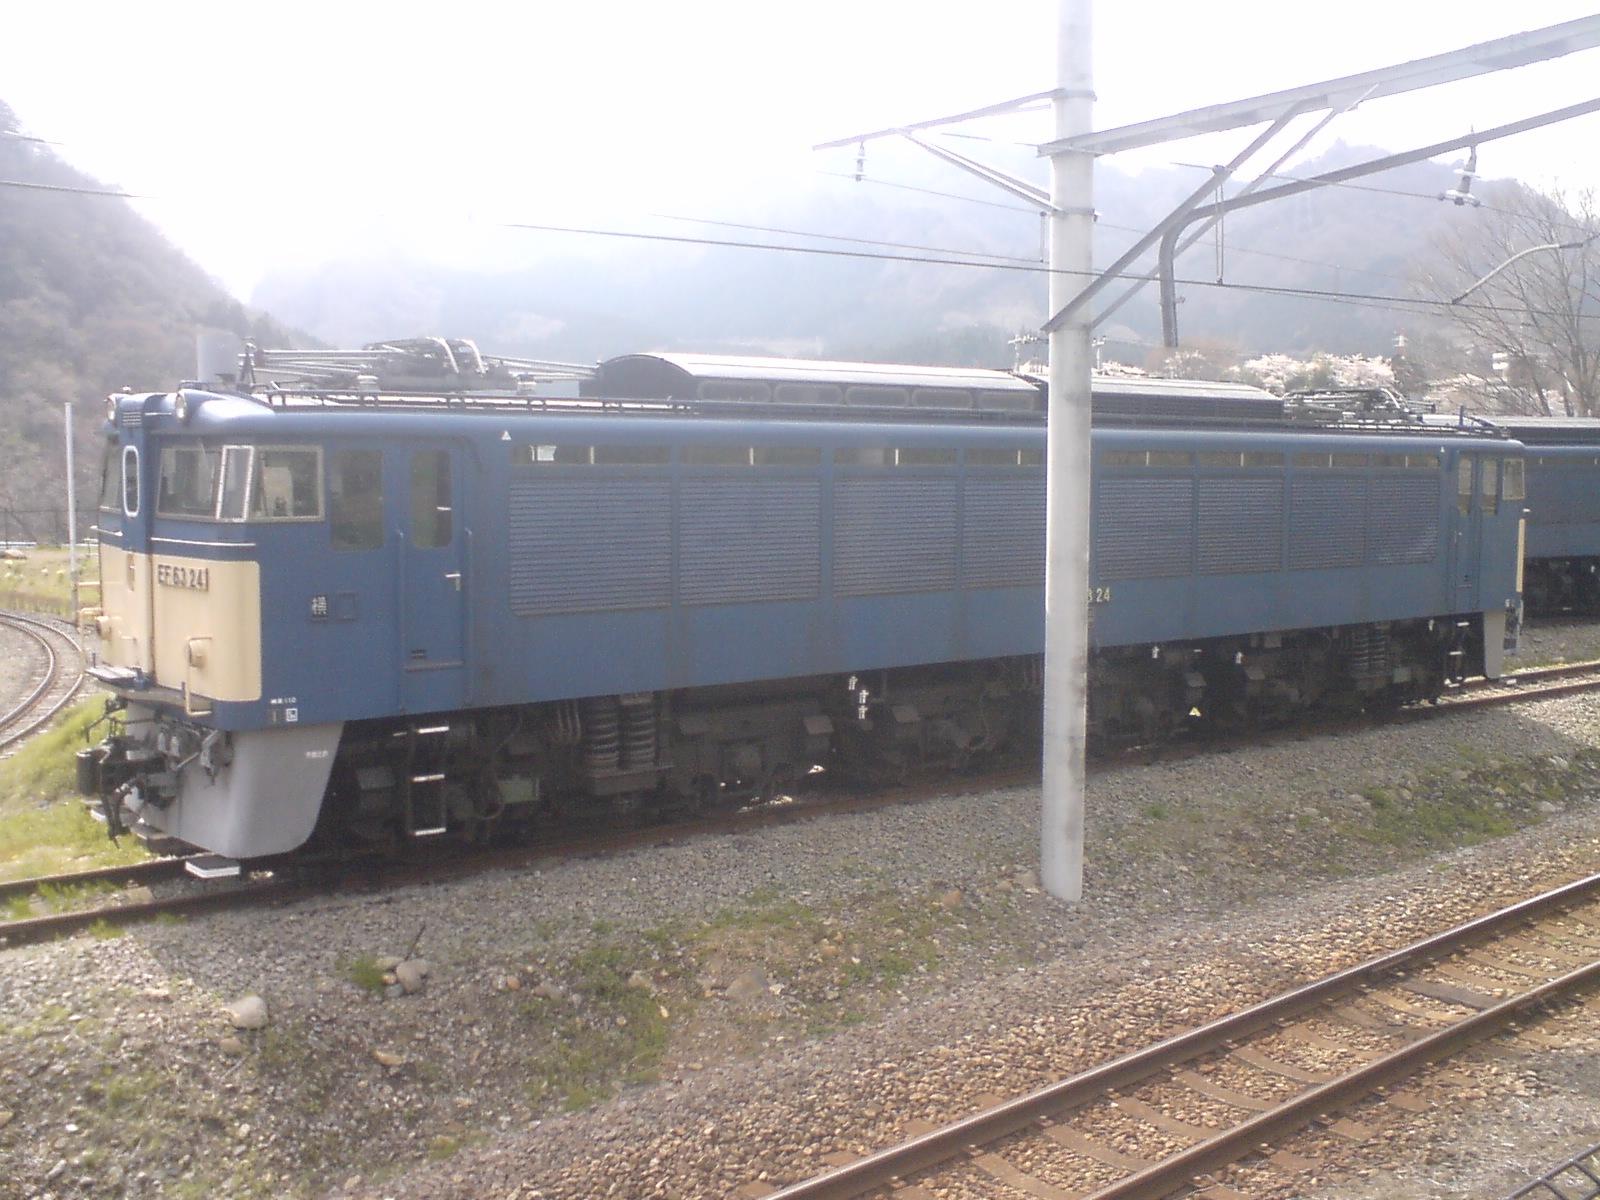 Kc380127